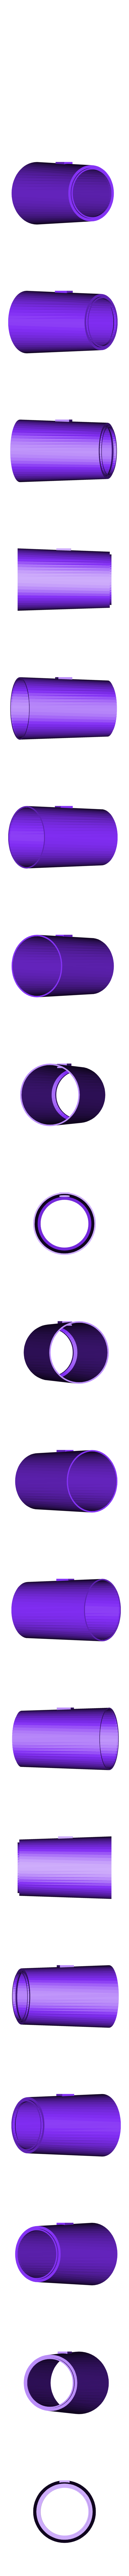 LH_round_body2.stl Download free STL file Round Base Lighthouse Model • Model to 3D print, Ogubal3D